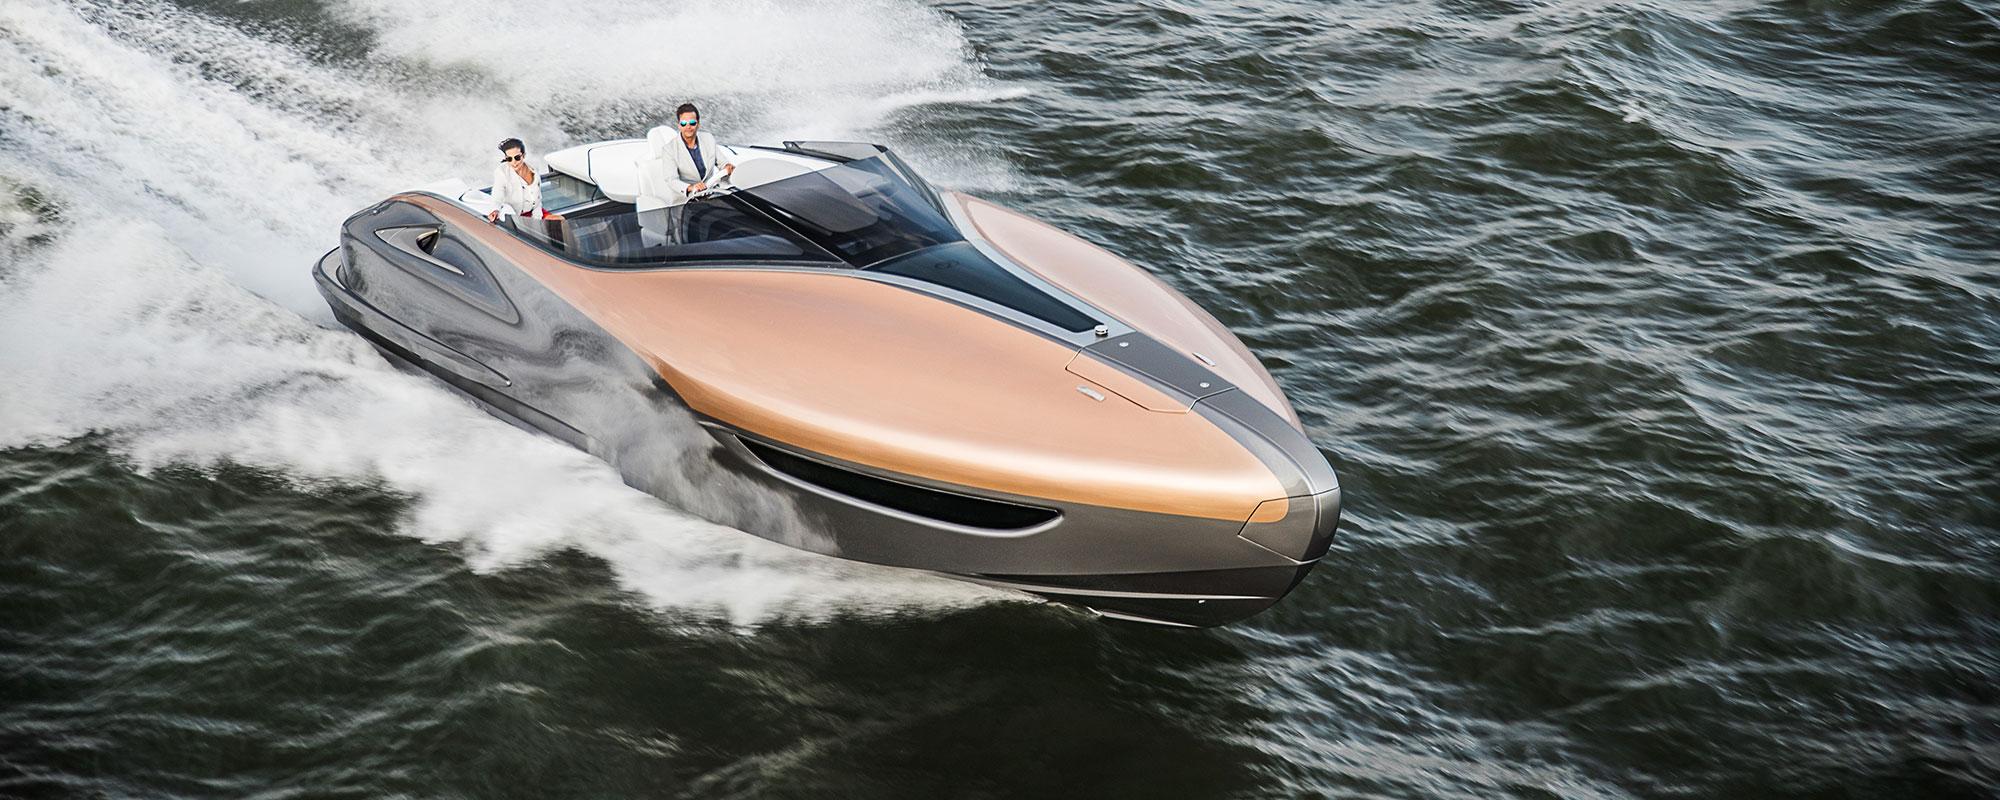 Lexus Sport Yacht – Lexus' premium performance yacht